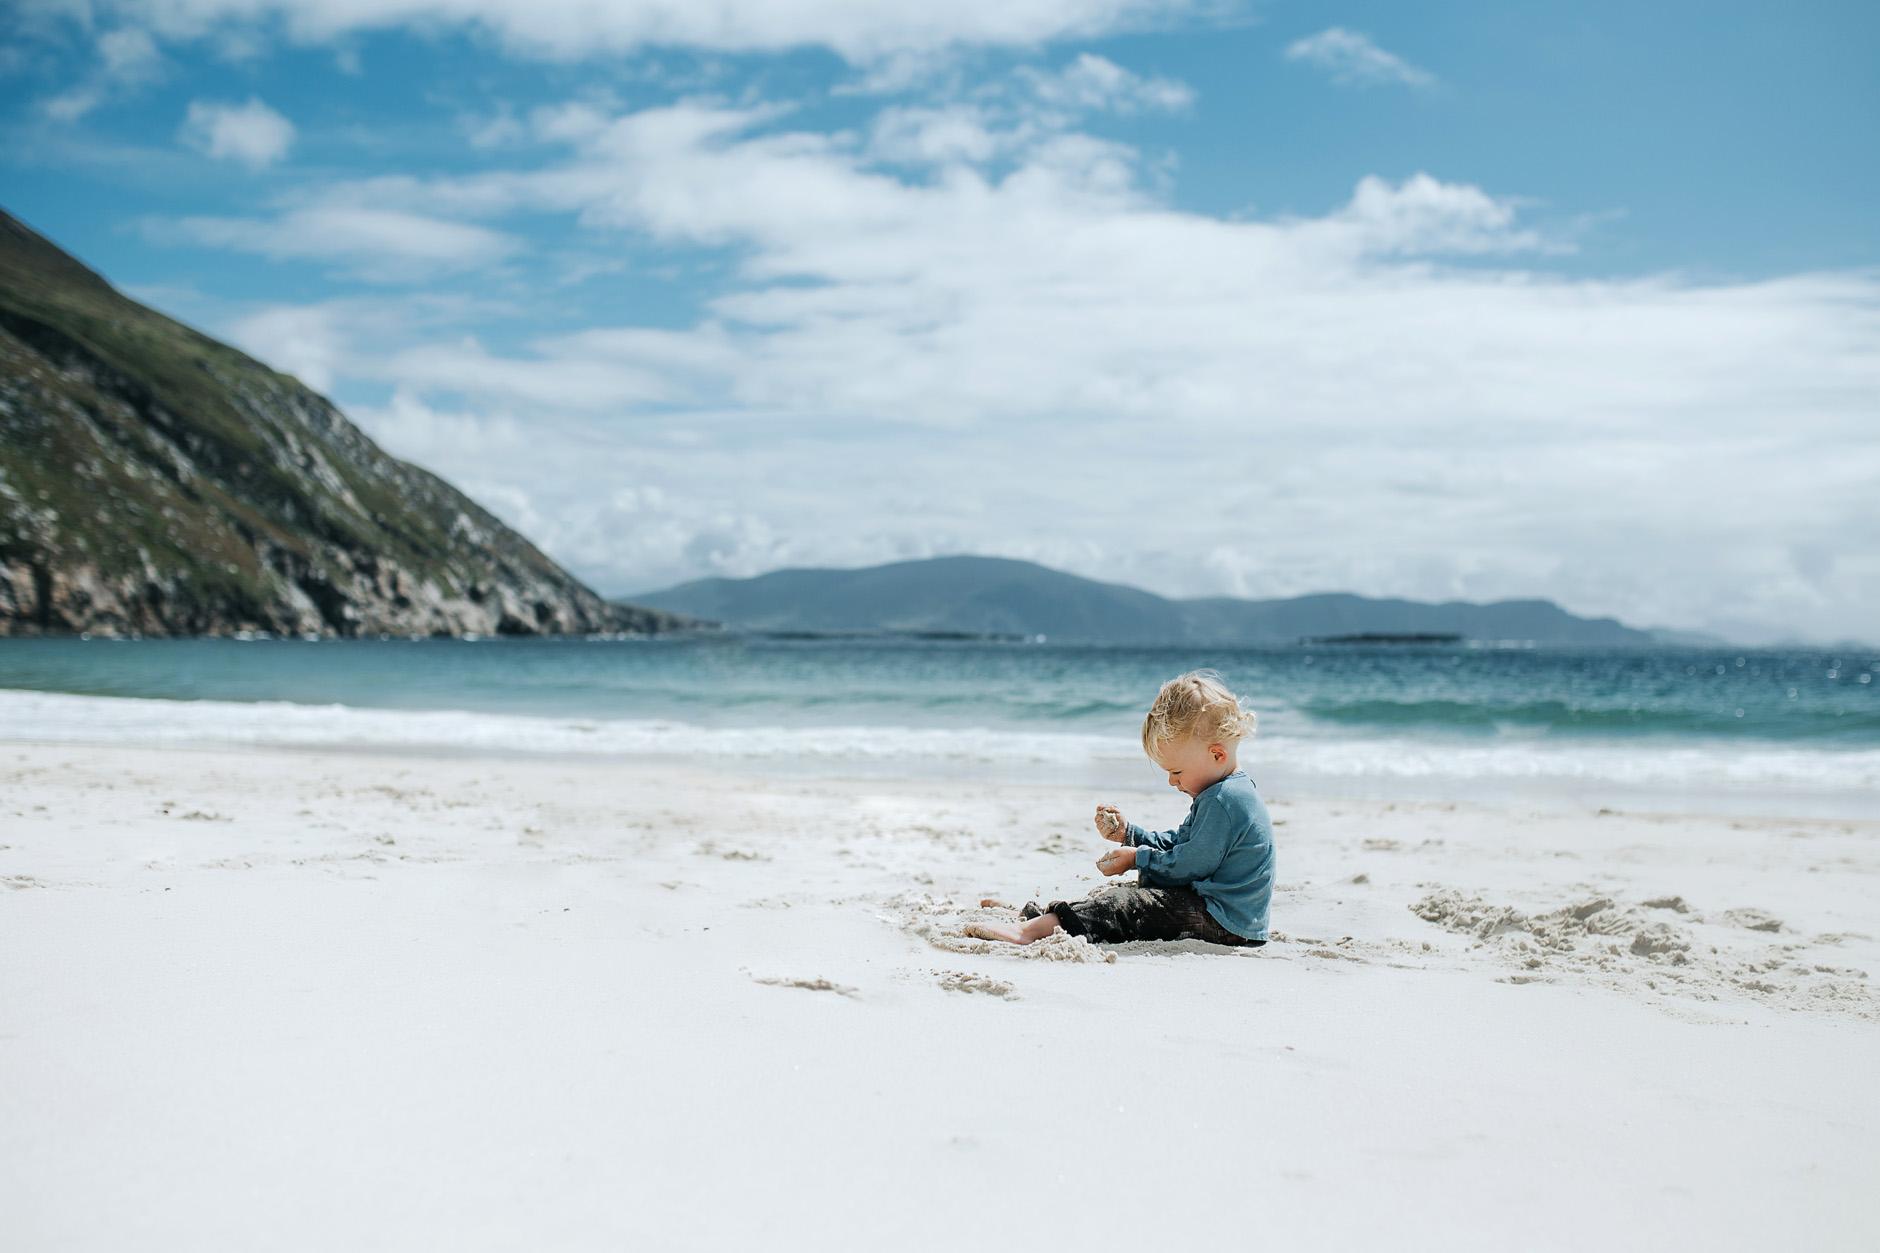 stunning-beach-family-vacation-photoshoot-achill-island-ireland-0018.jpg